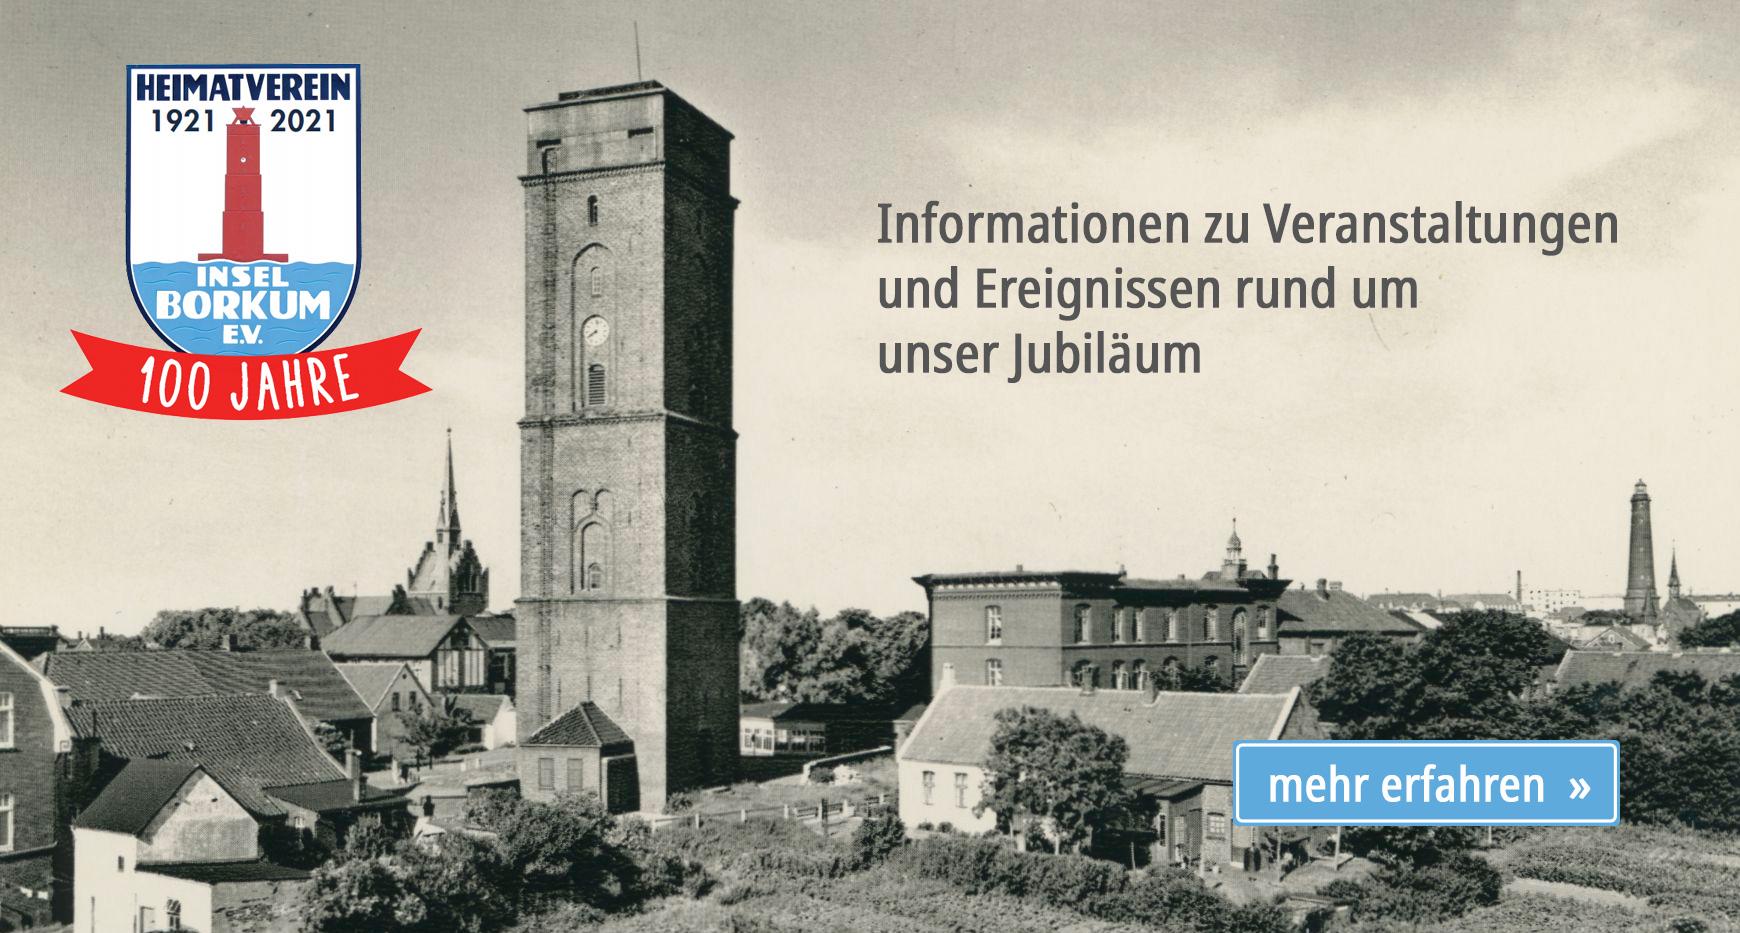 100 Jahre Heimatverein Borkum